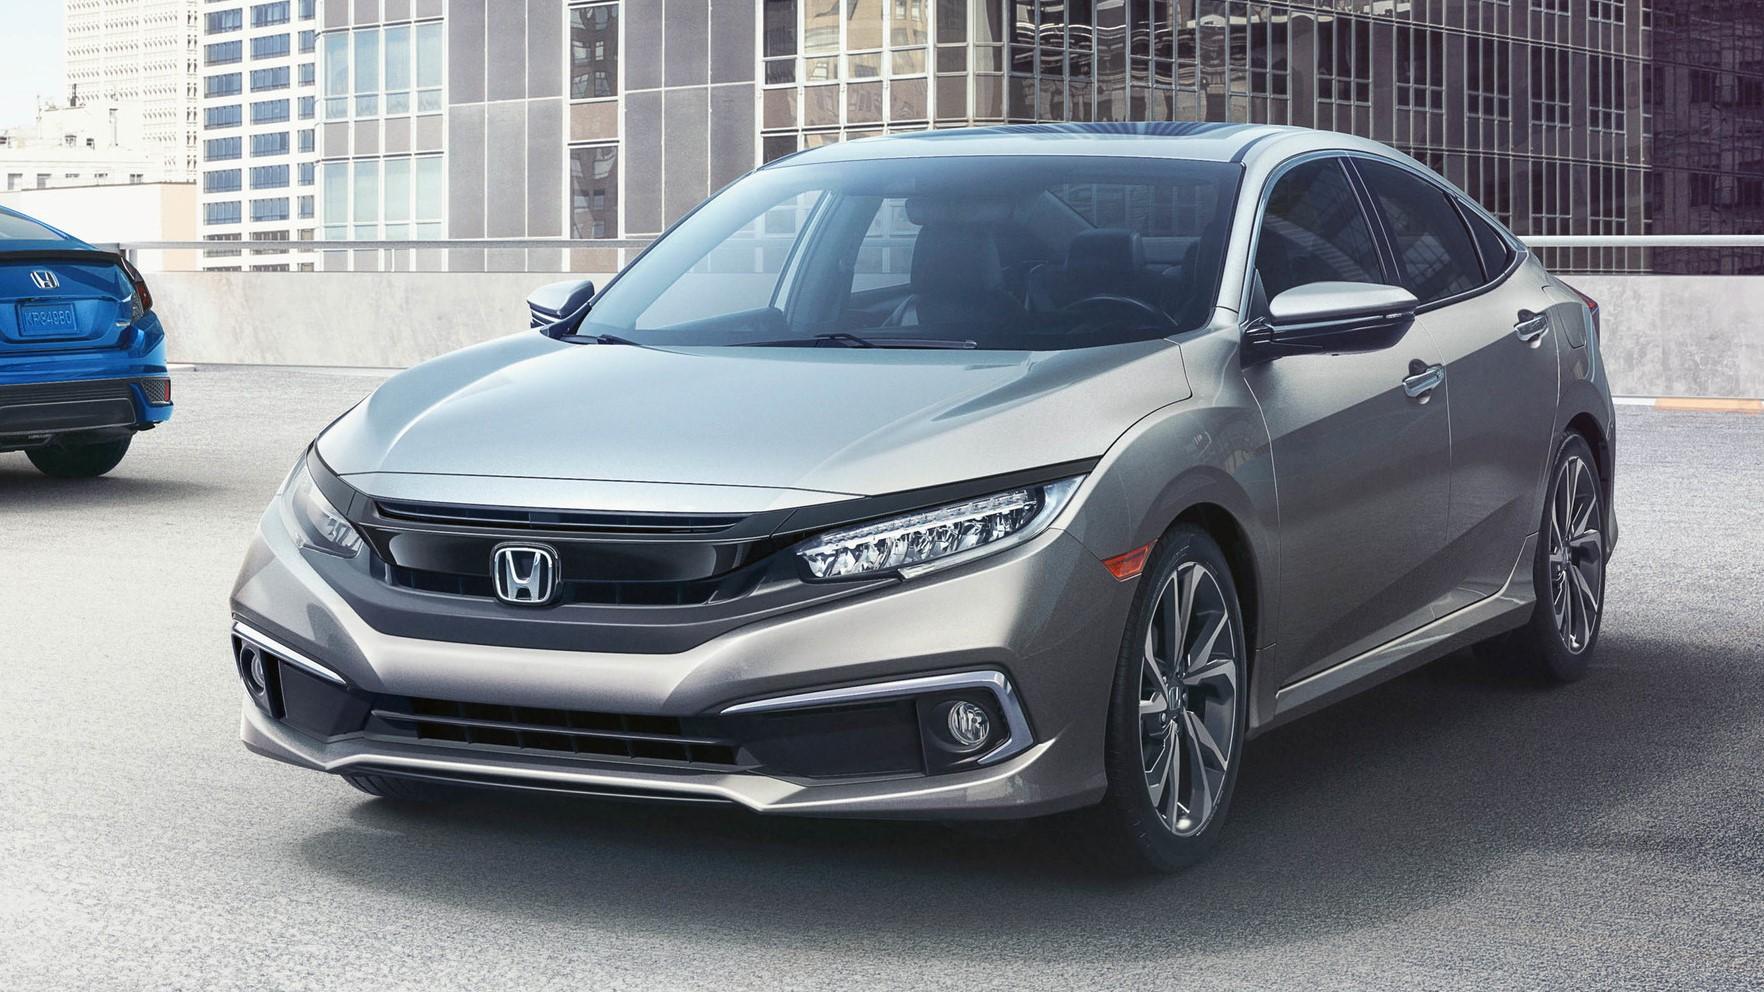 Honda reveals updated Civic